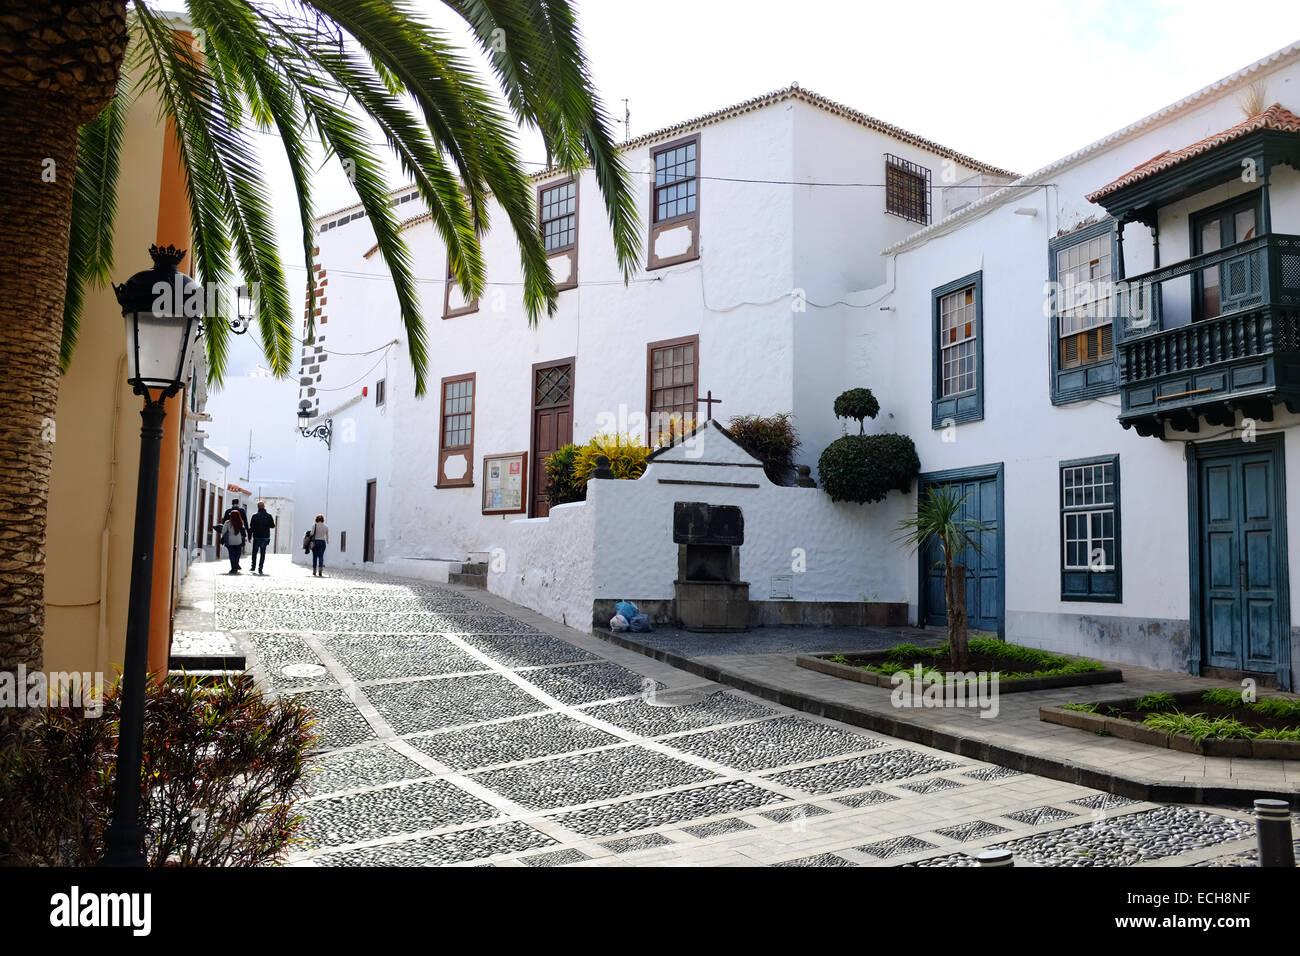 Eine Straße in Santa Cruz De La Palma, La Palma, Kanarische Inseln, Spanien Stockbild